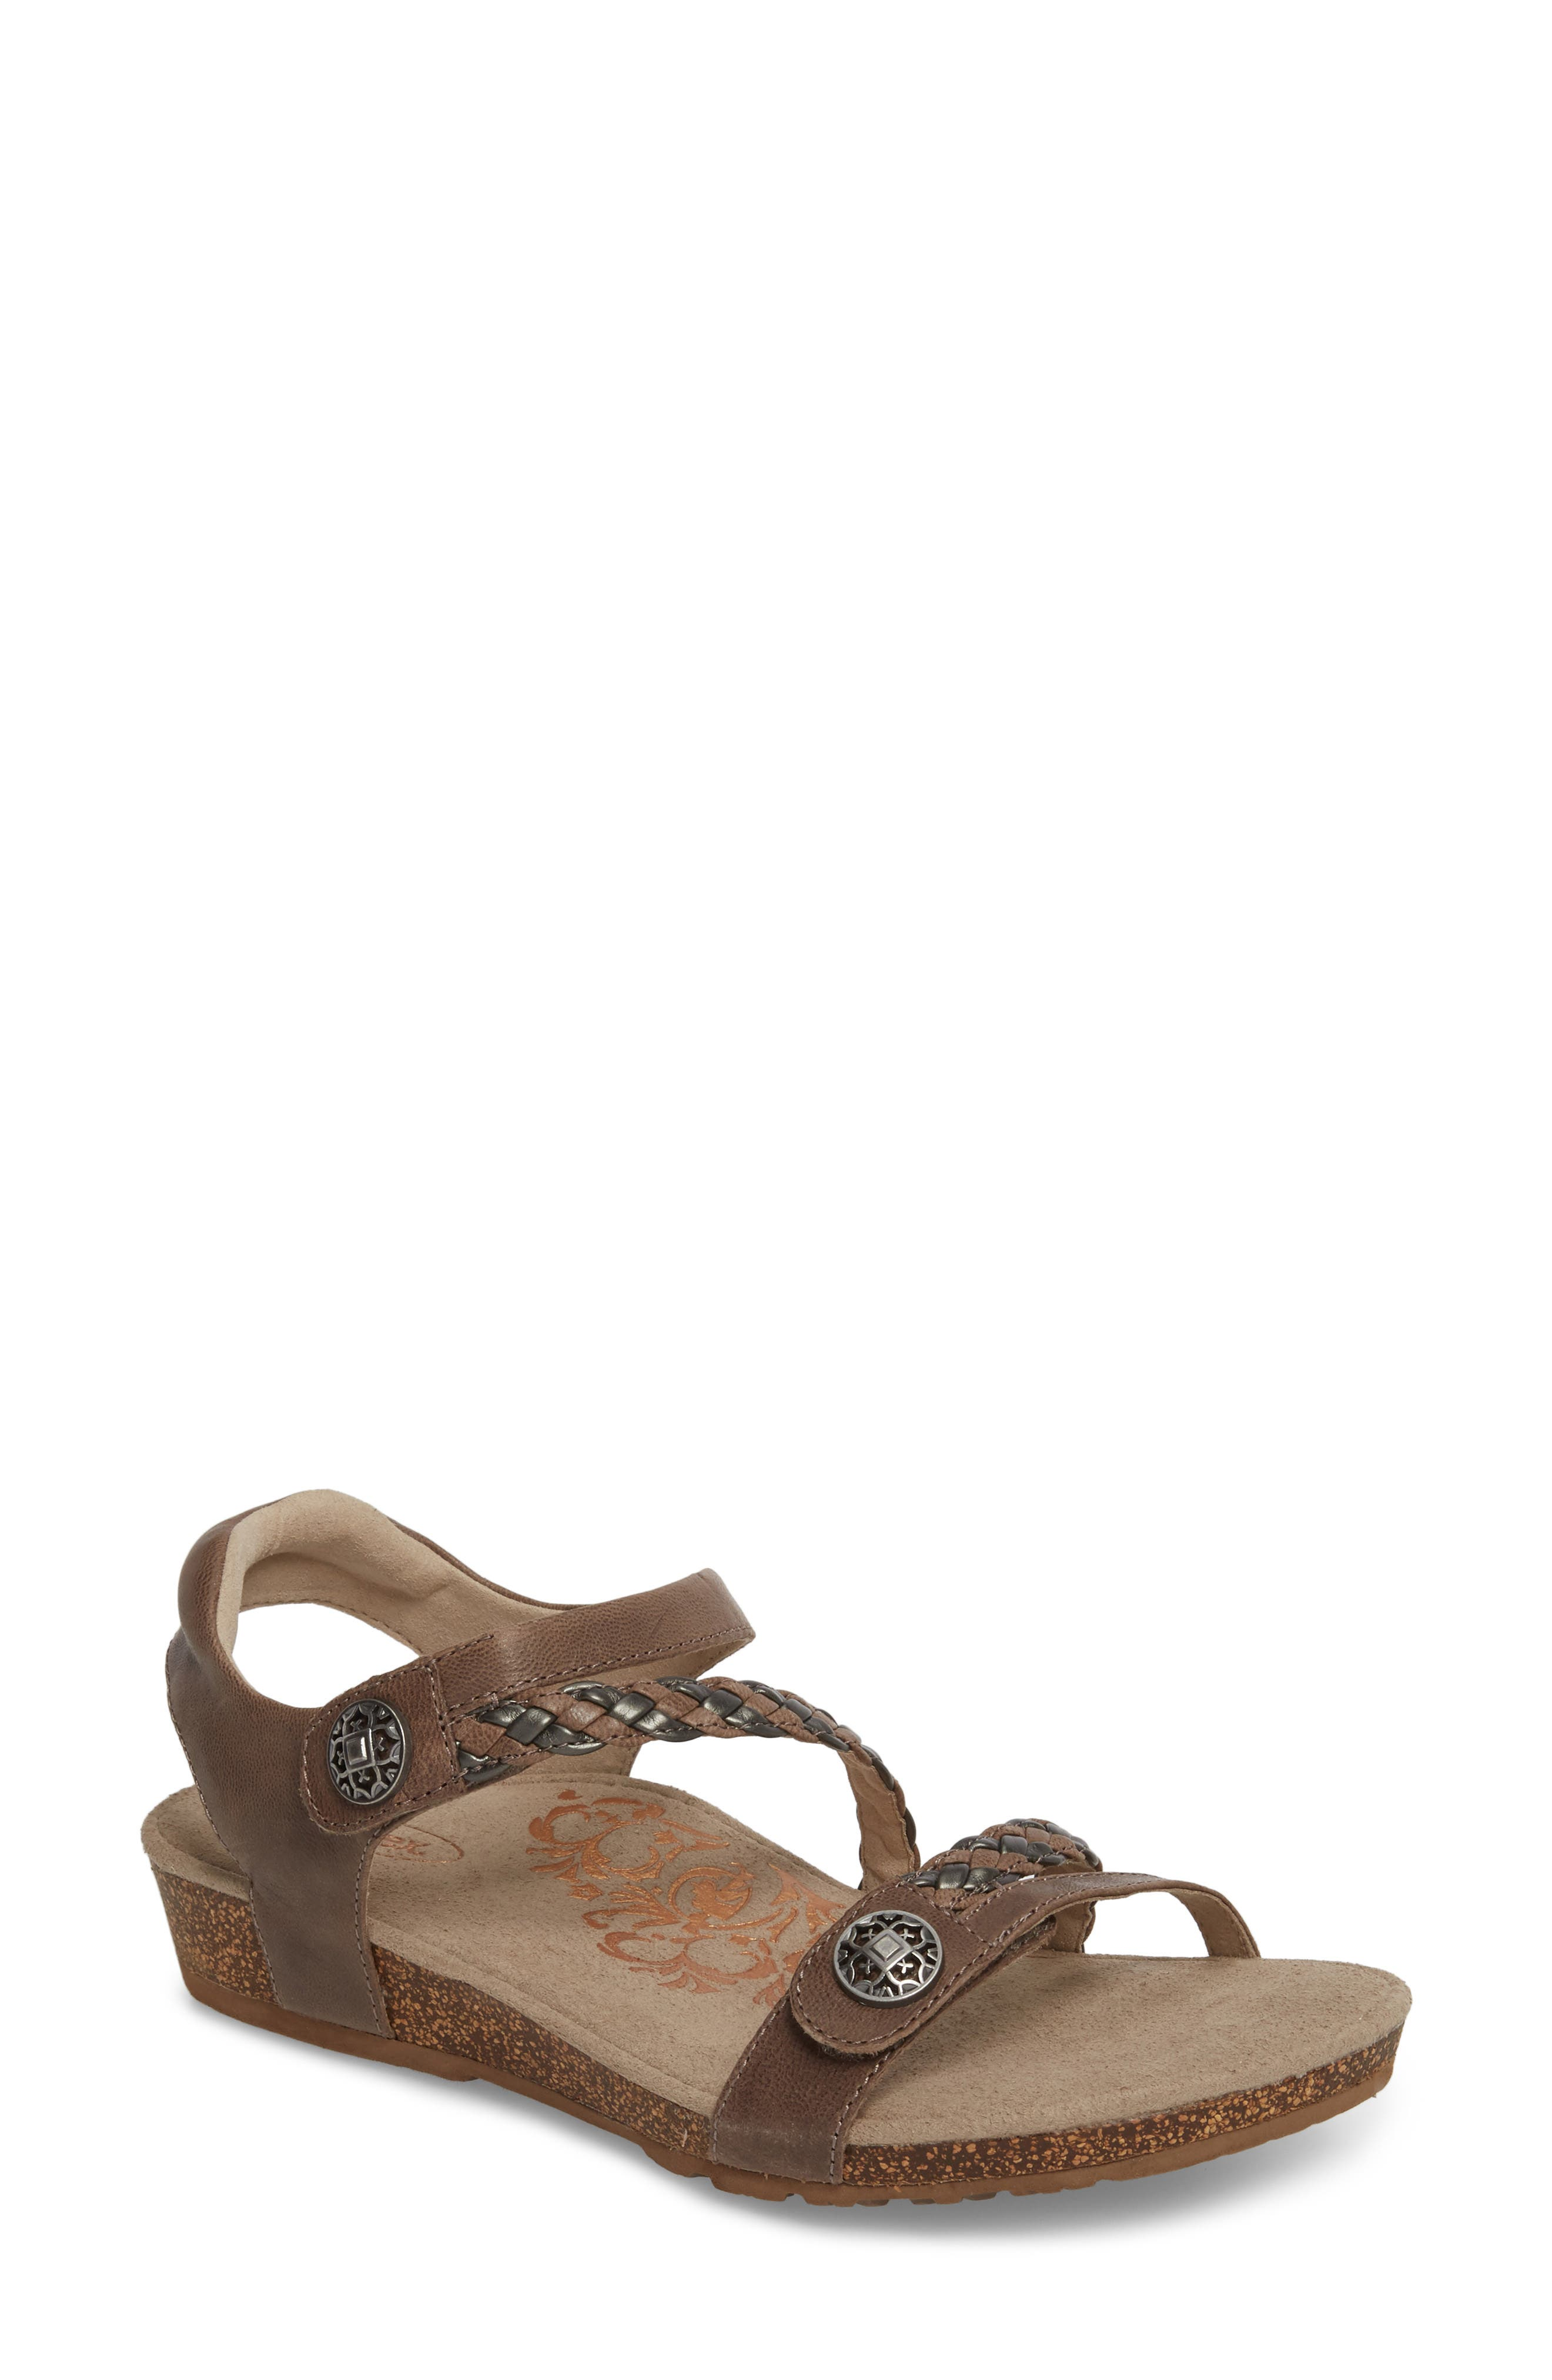 'Jillian' Braided Leather Strap Sandal,                         Main,                         color, GREY LEATHER